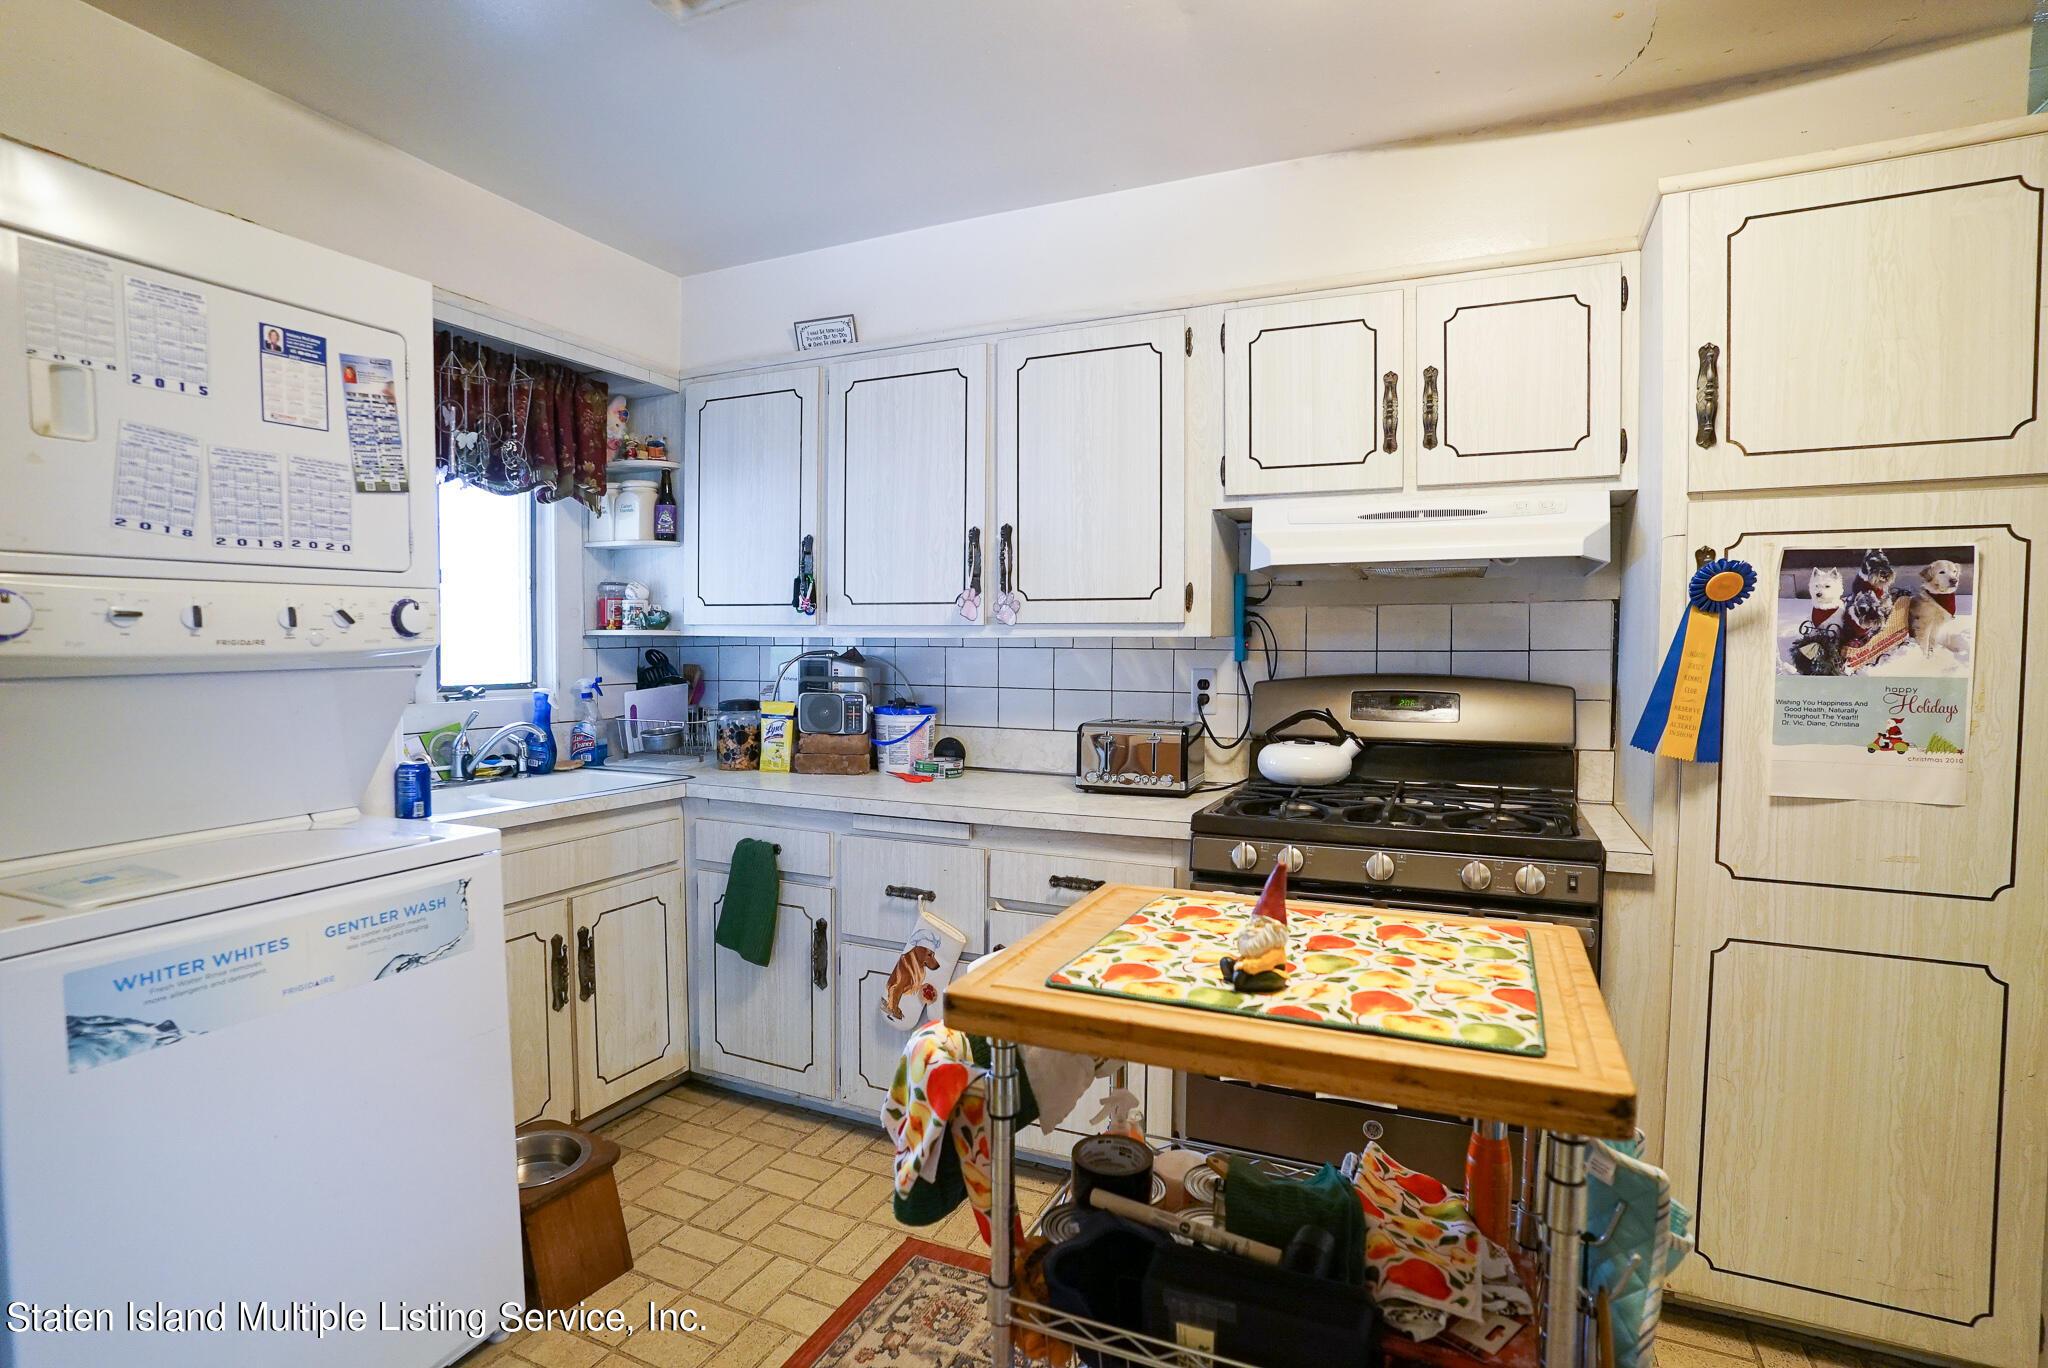 Single Family - Detached 121 Parkinson Avenue  Staten Island, NY 10305, MLS-1147747-13